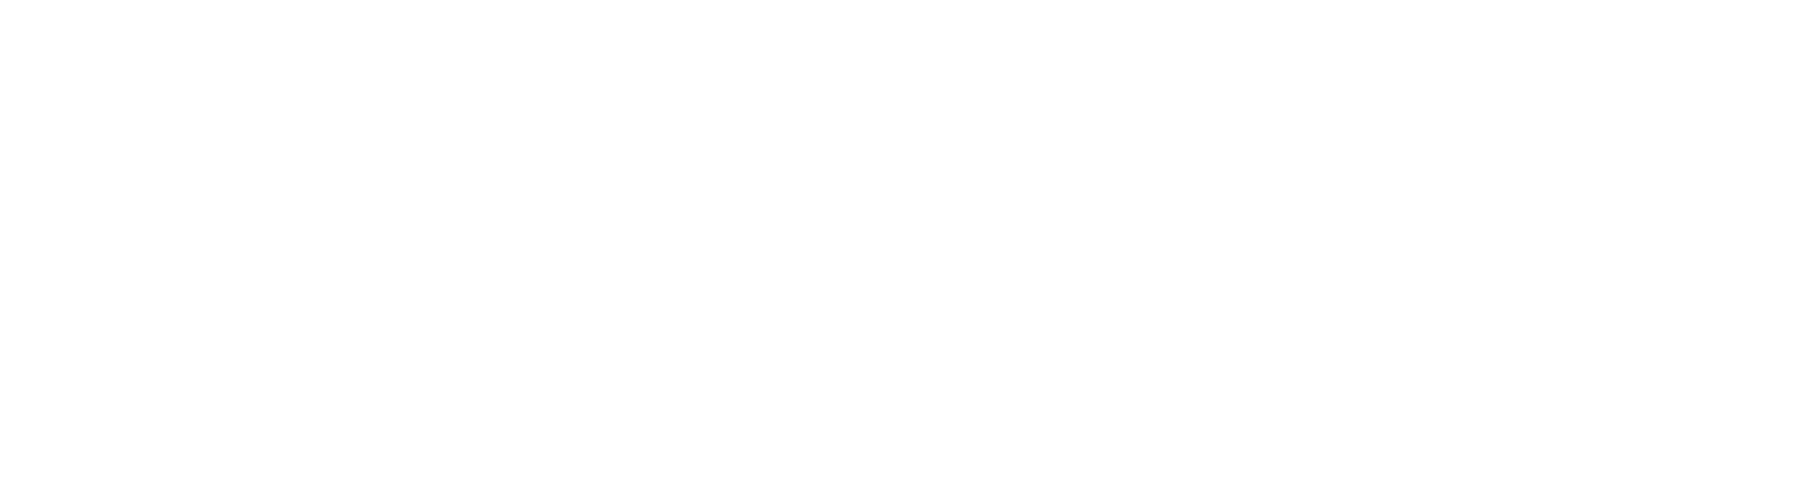 FormulaMod